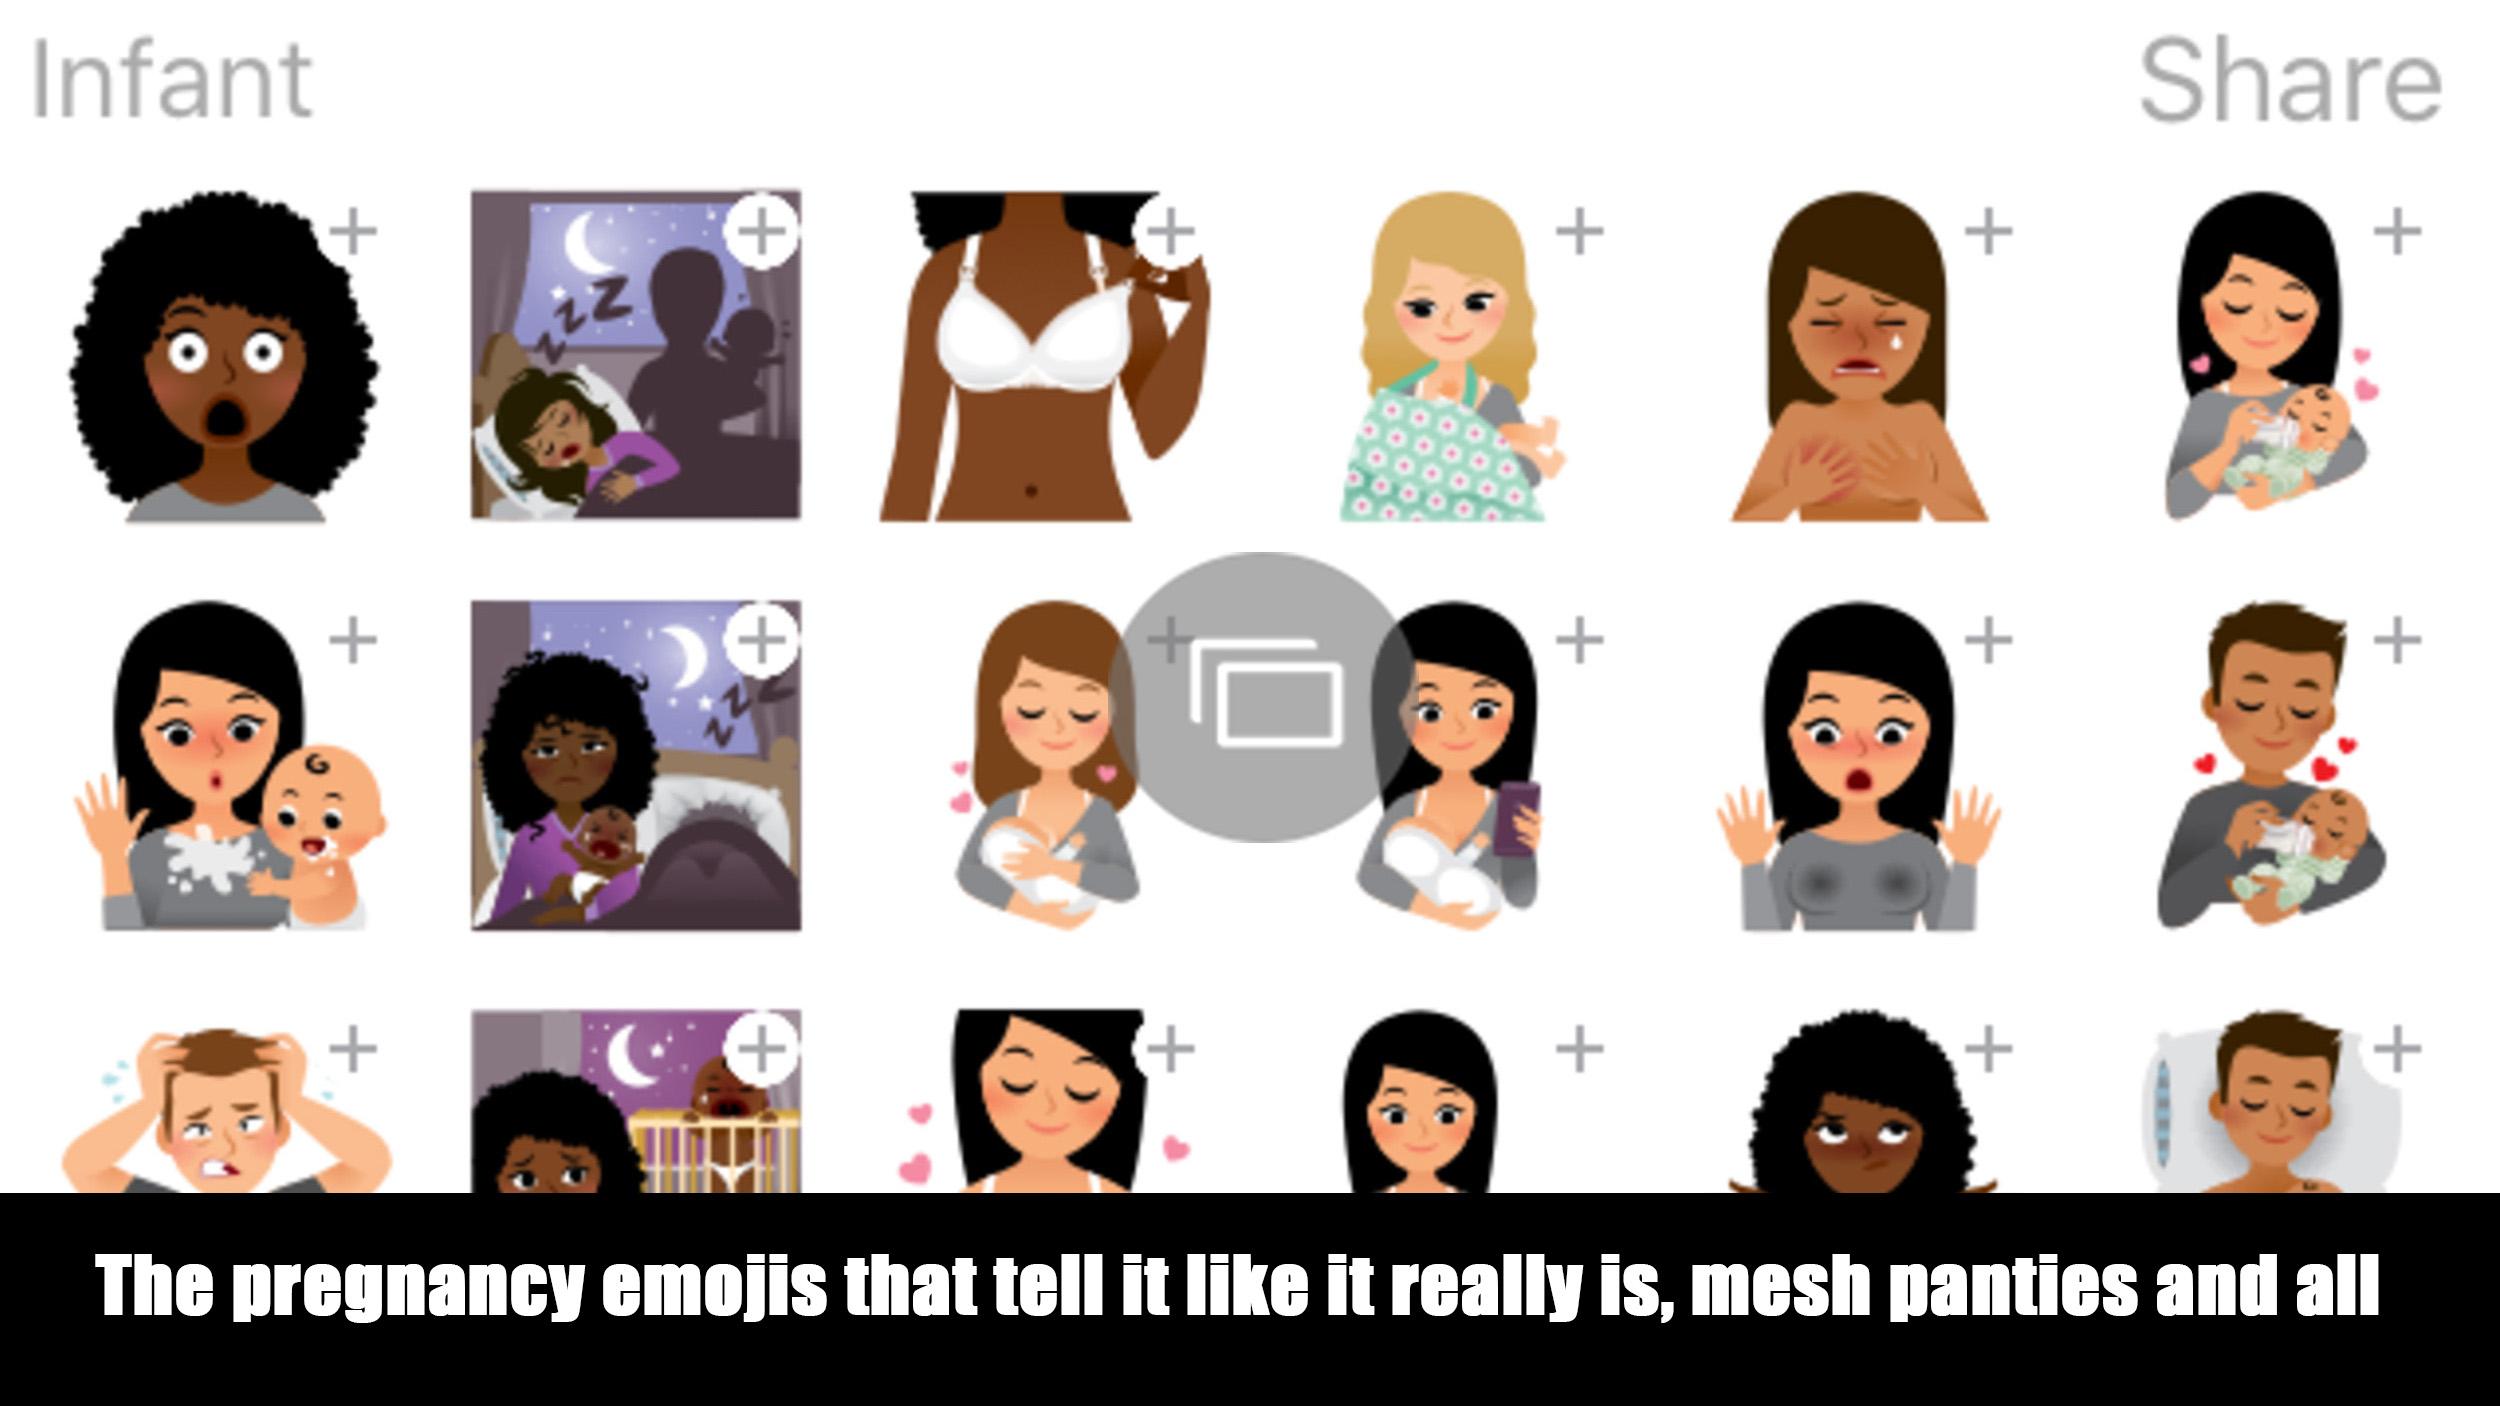 Pregnancy emojis